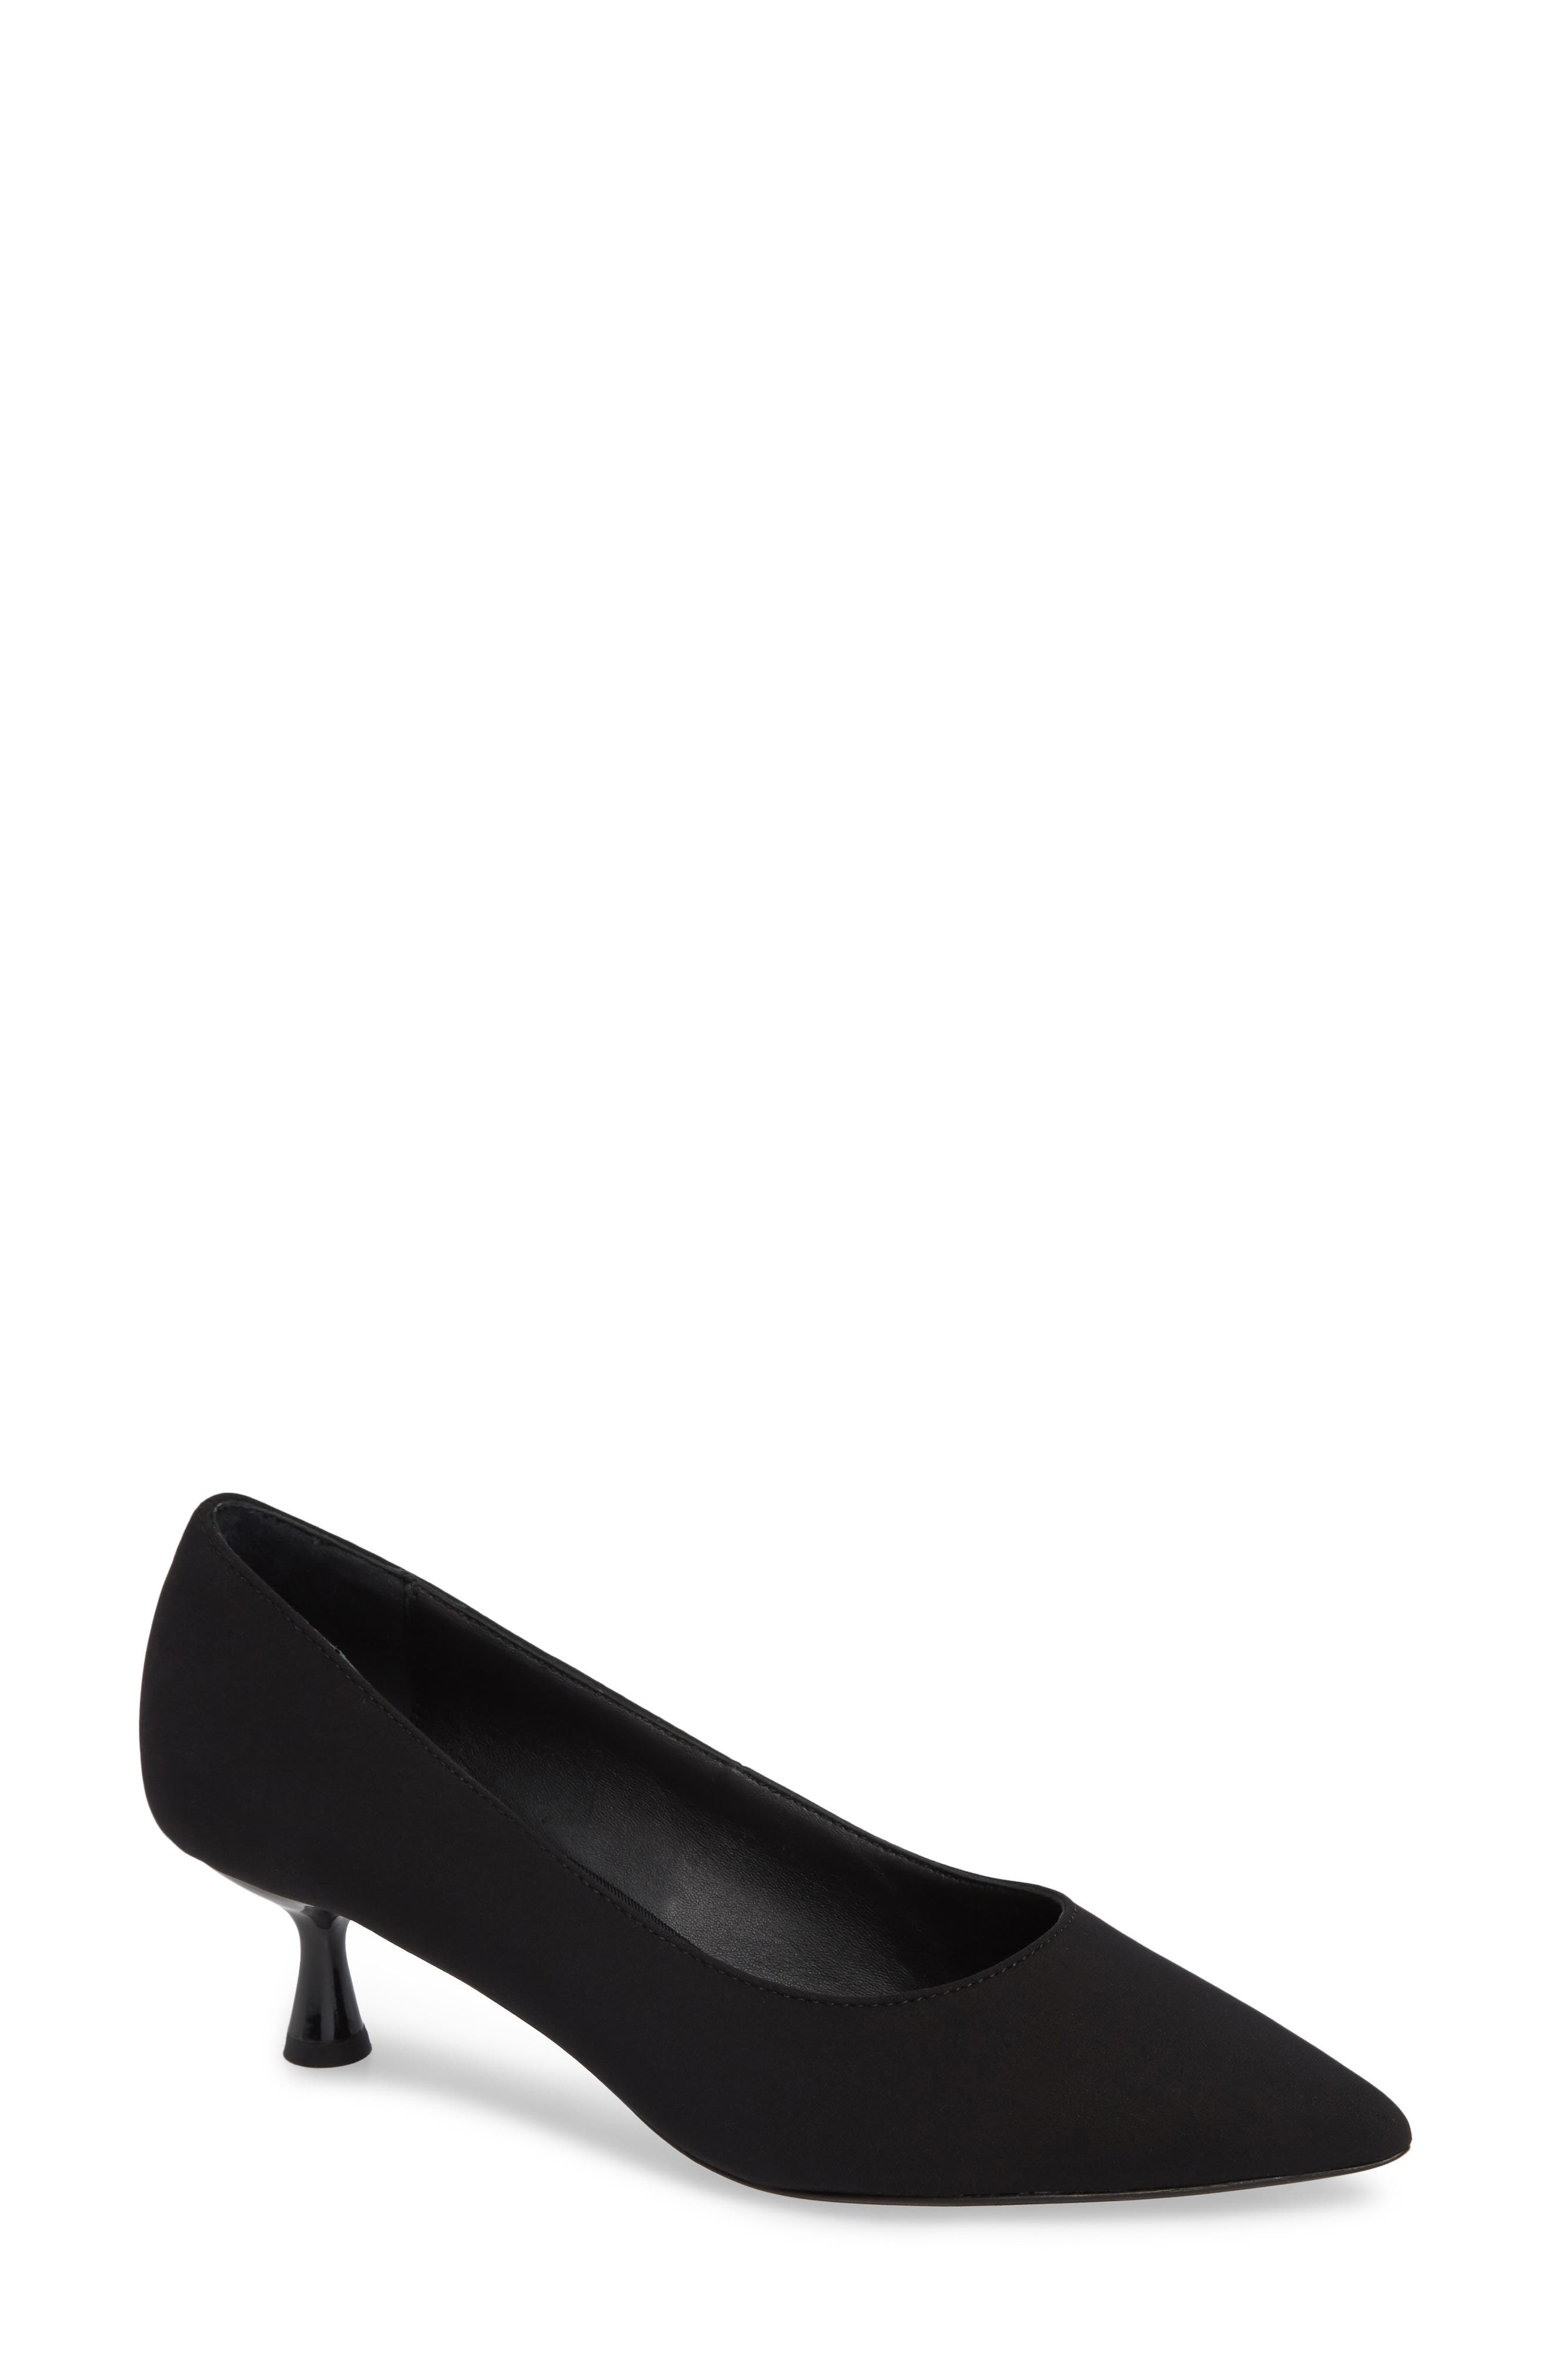 DONALD PLINER Bon Pointed-Toe Low Crepe Pumps in Black Crepe